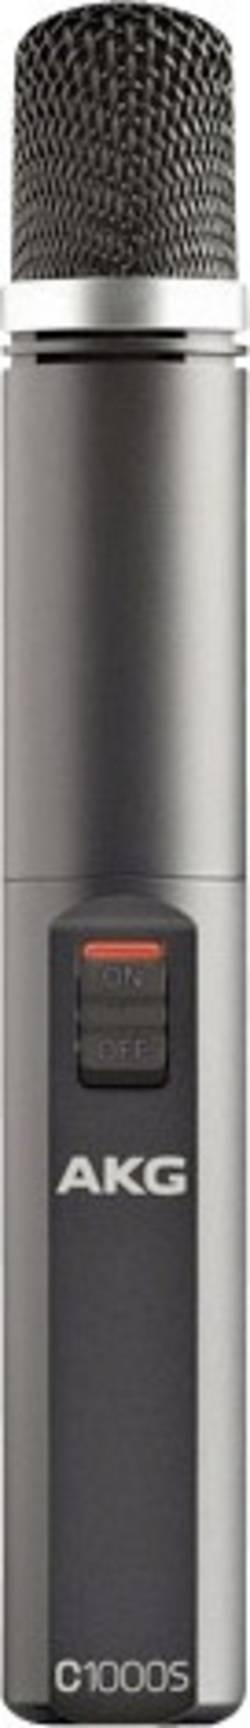 Micro à condensateur AKG C1000 S MK IV